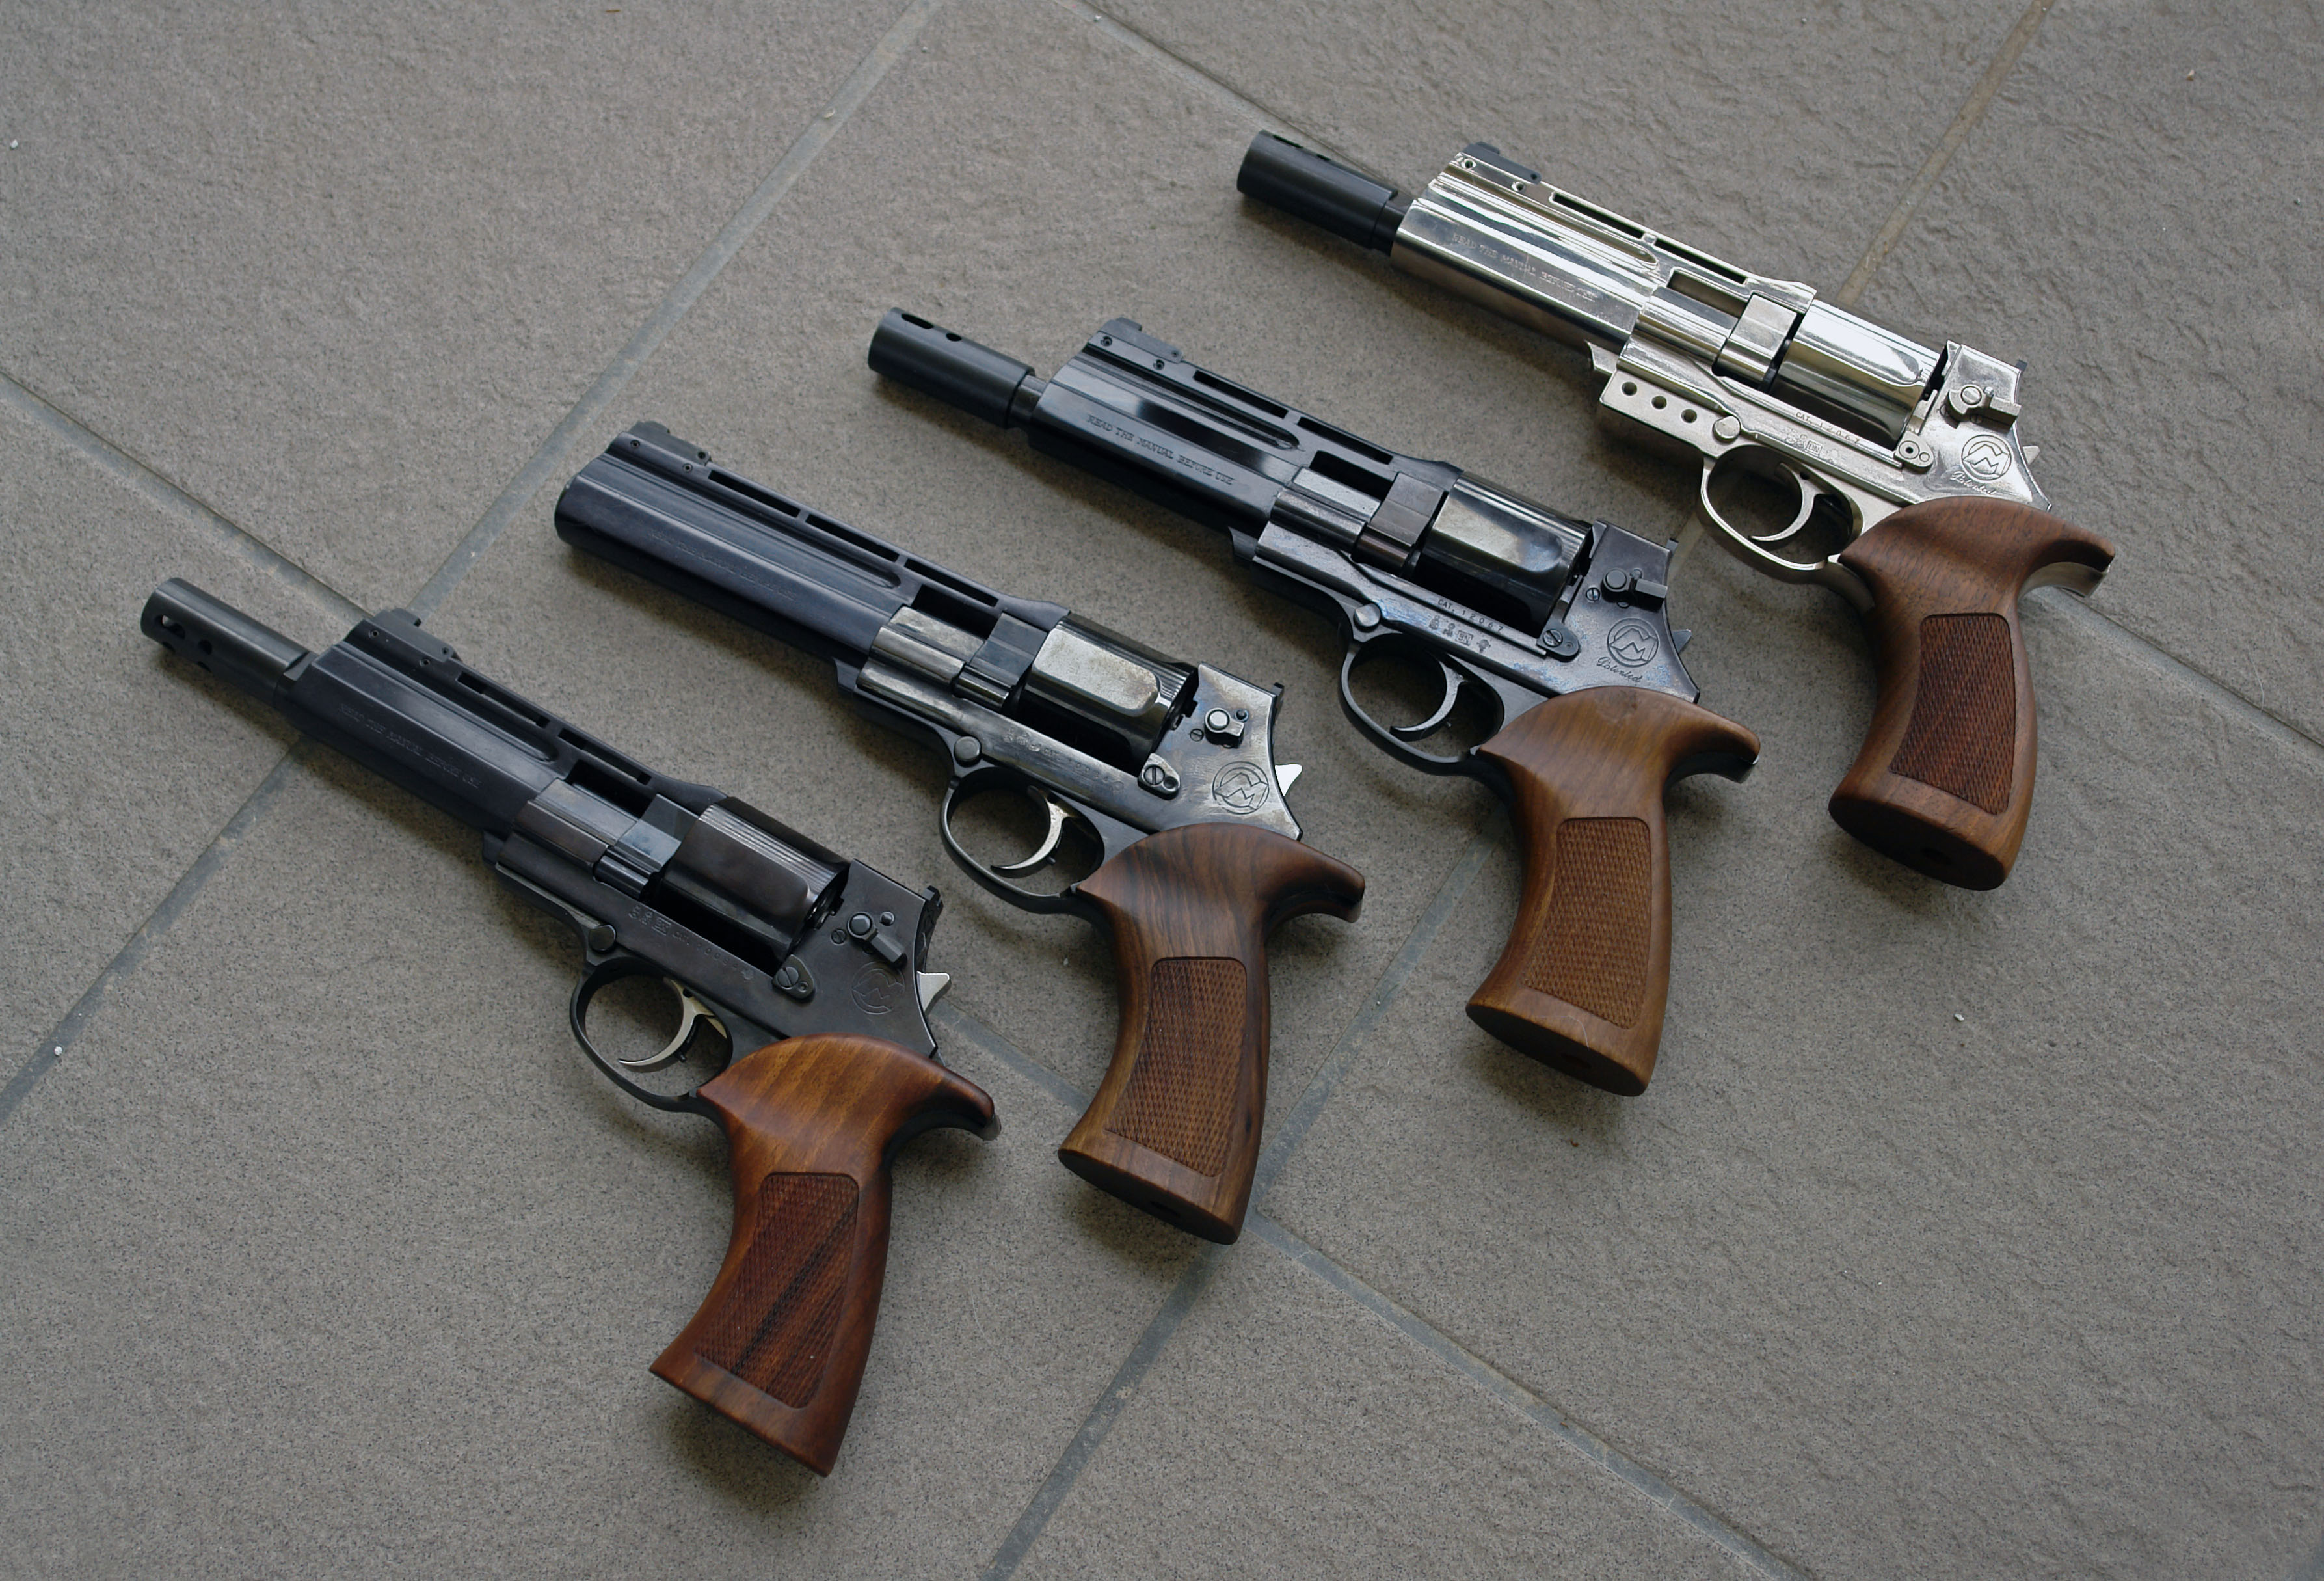 3573x2430 > Mateba Unica Revolver Wallpapers